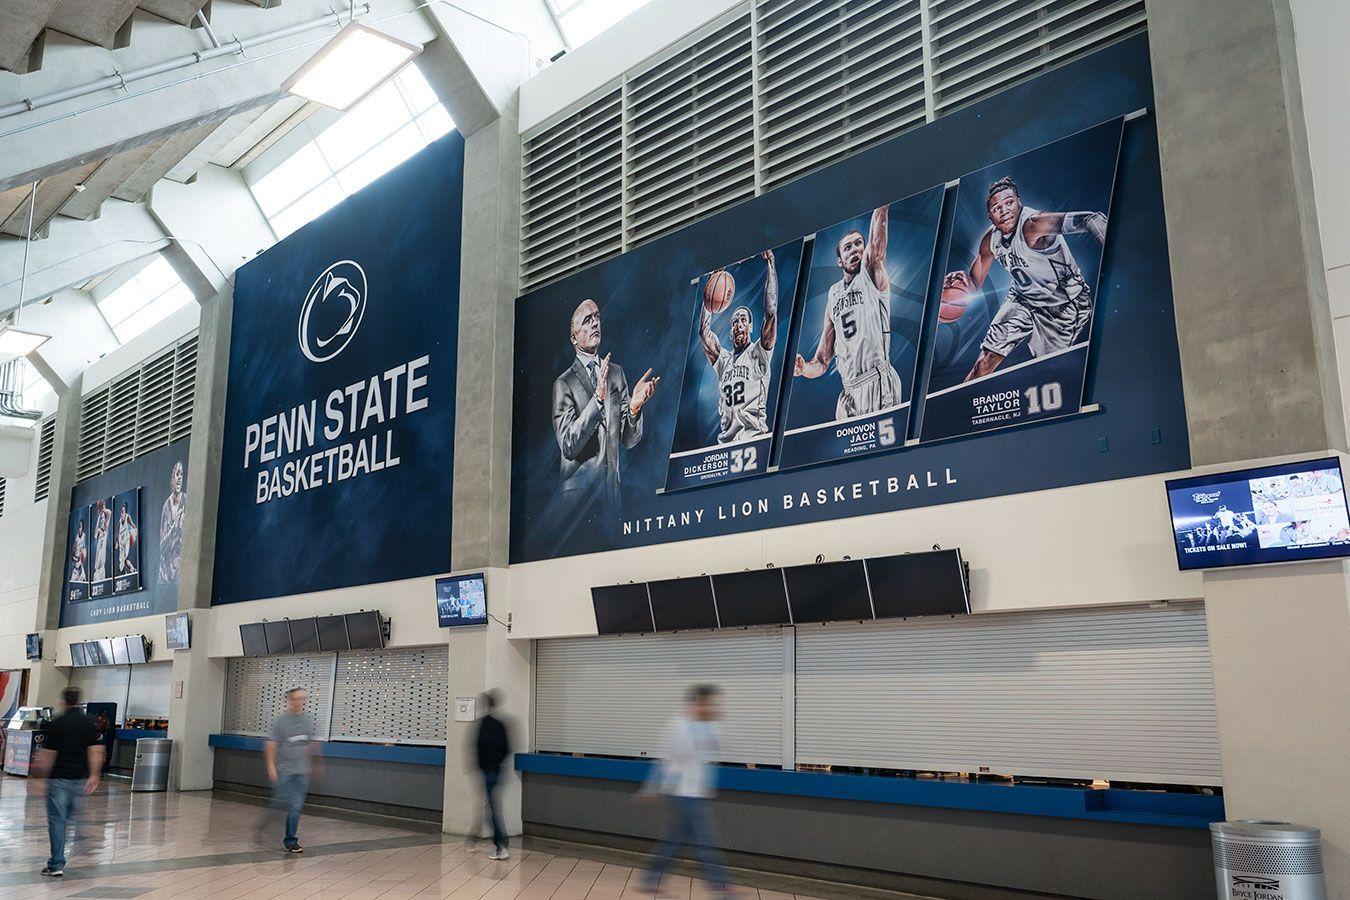 Advent on Penn state, Penn state basketball, Sports photos